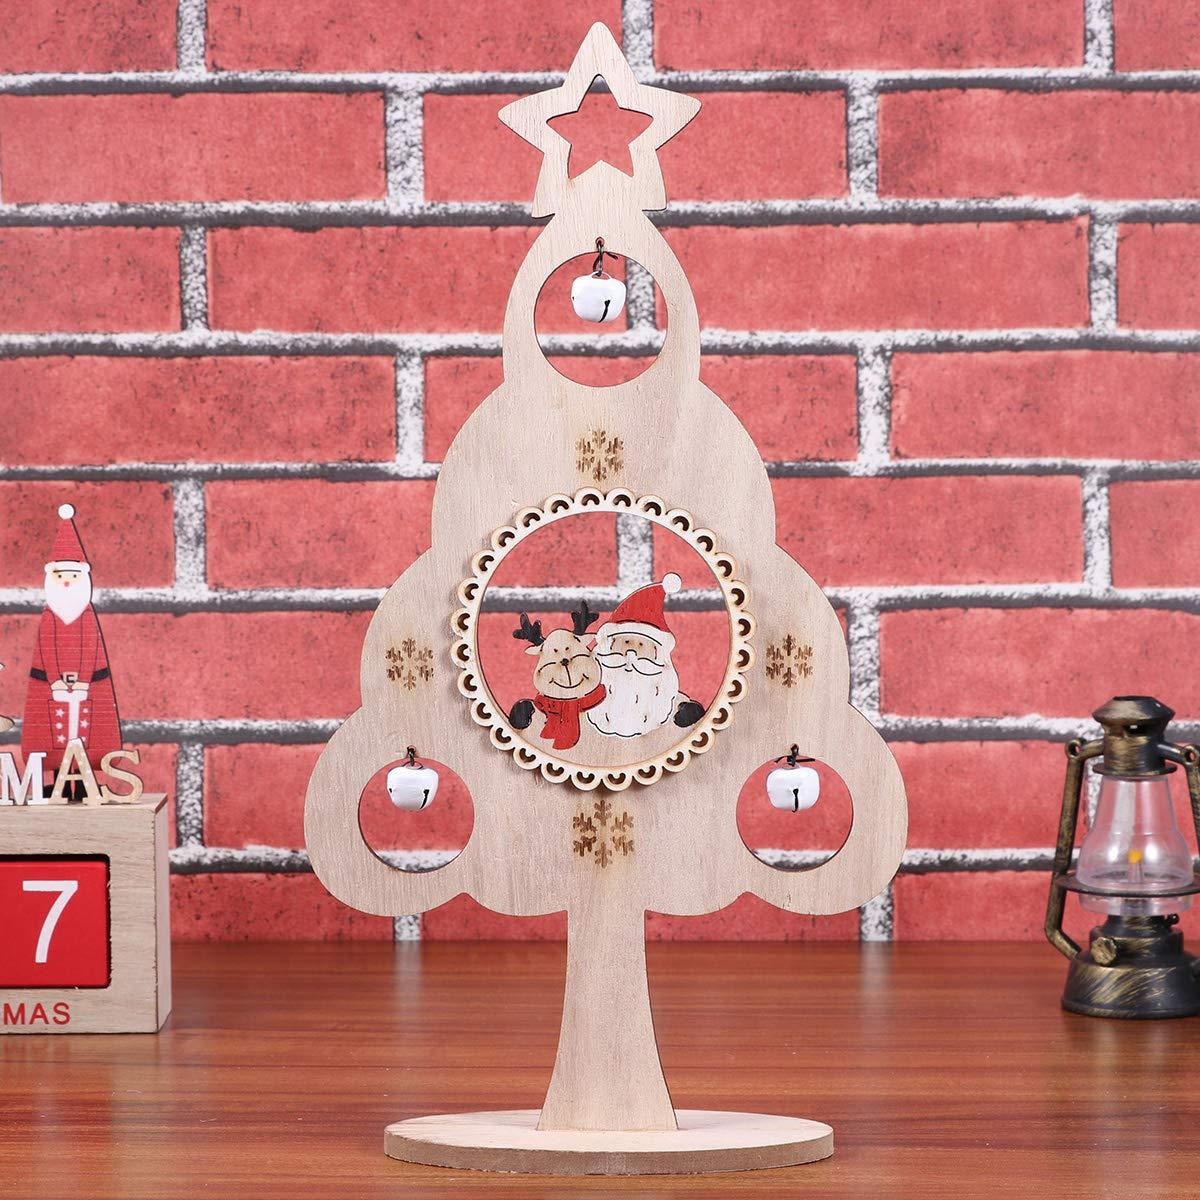 BESTOYARD Small Wooden Tabletop Christmas Tree with Jingle Bell Snowflake Santa Claus Reindeer Rustic Vintage Christmas Decorations Ornaments Xmas Table Centerpiece